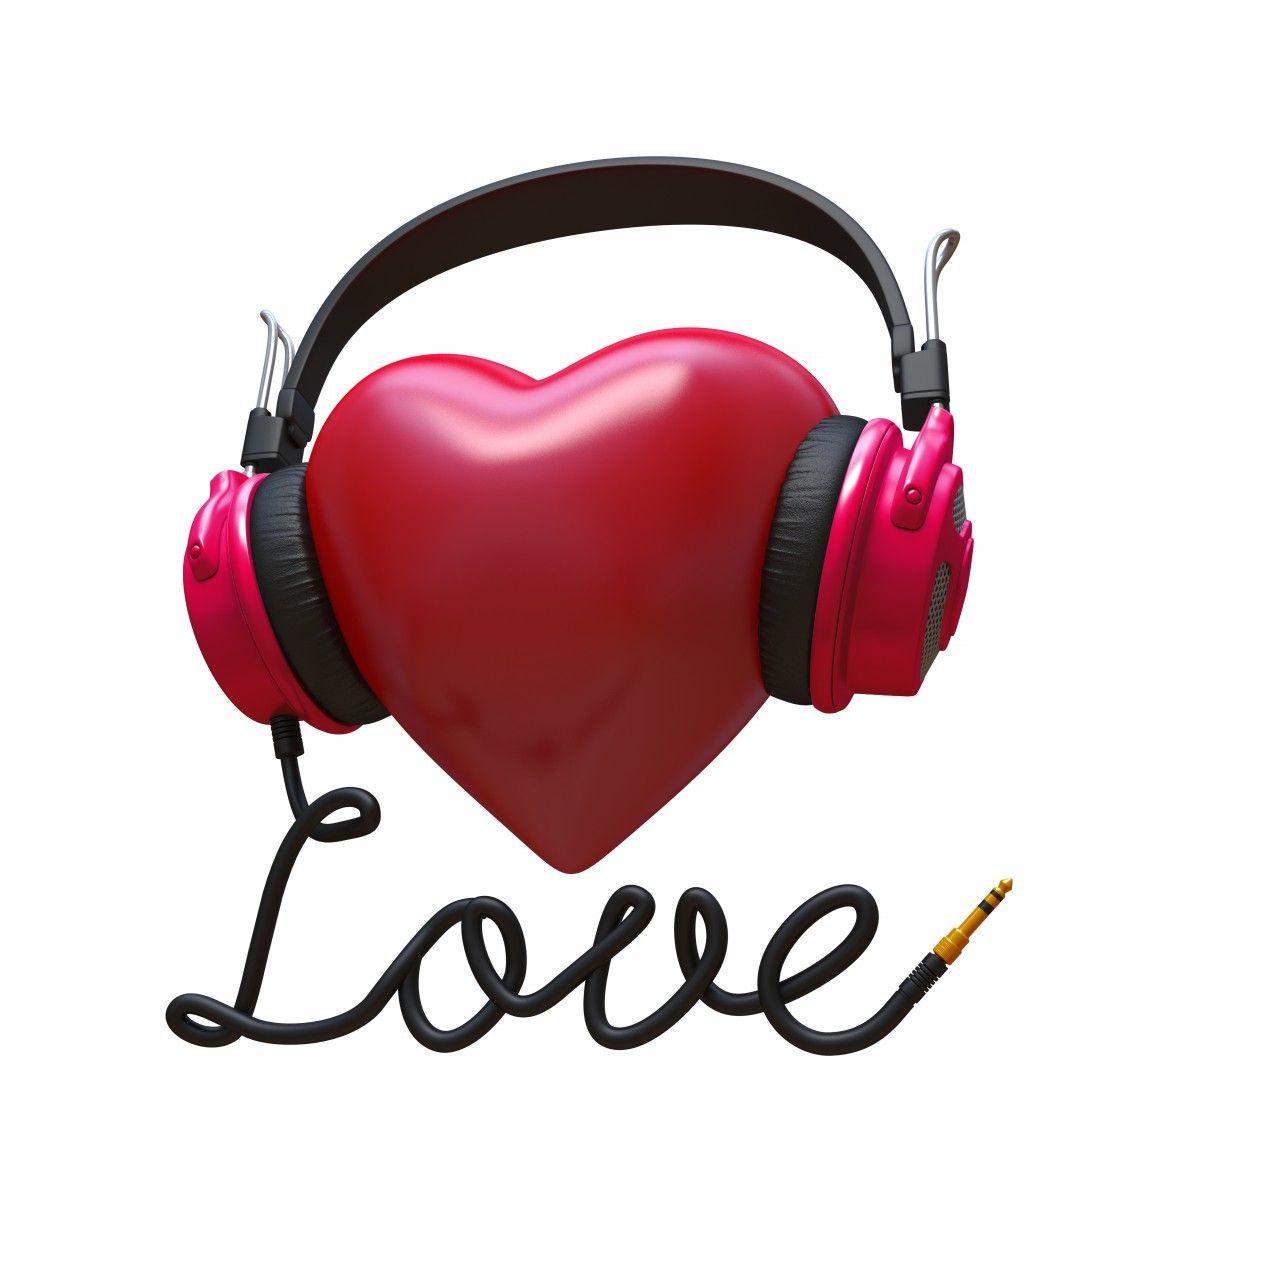 3d rock music concept headphones heart 780x780 Celebrating Valentines ...